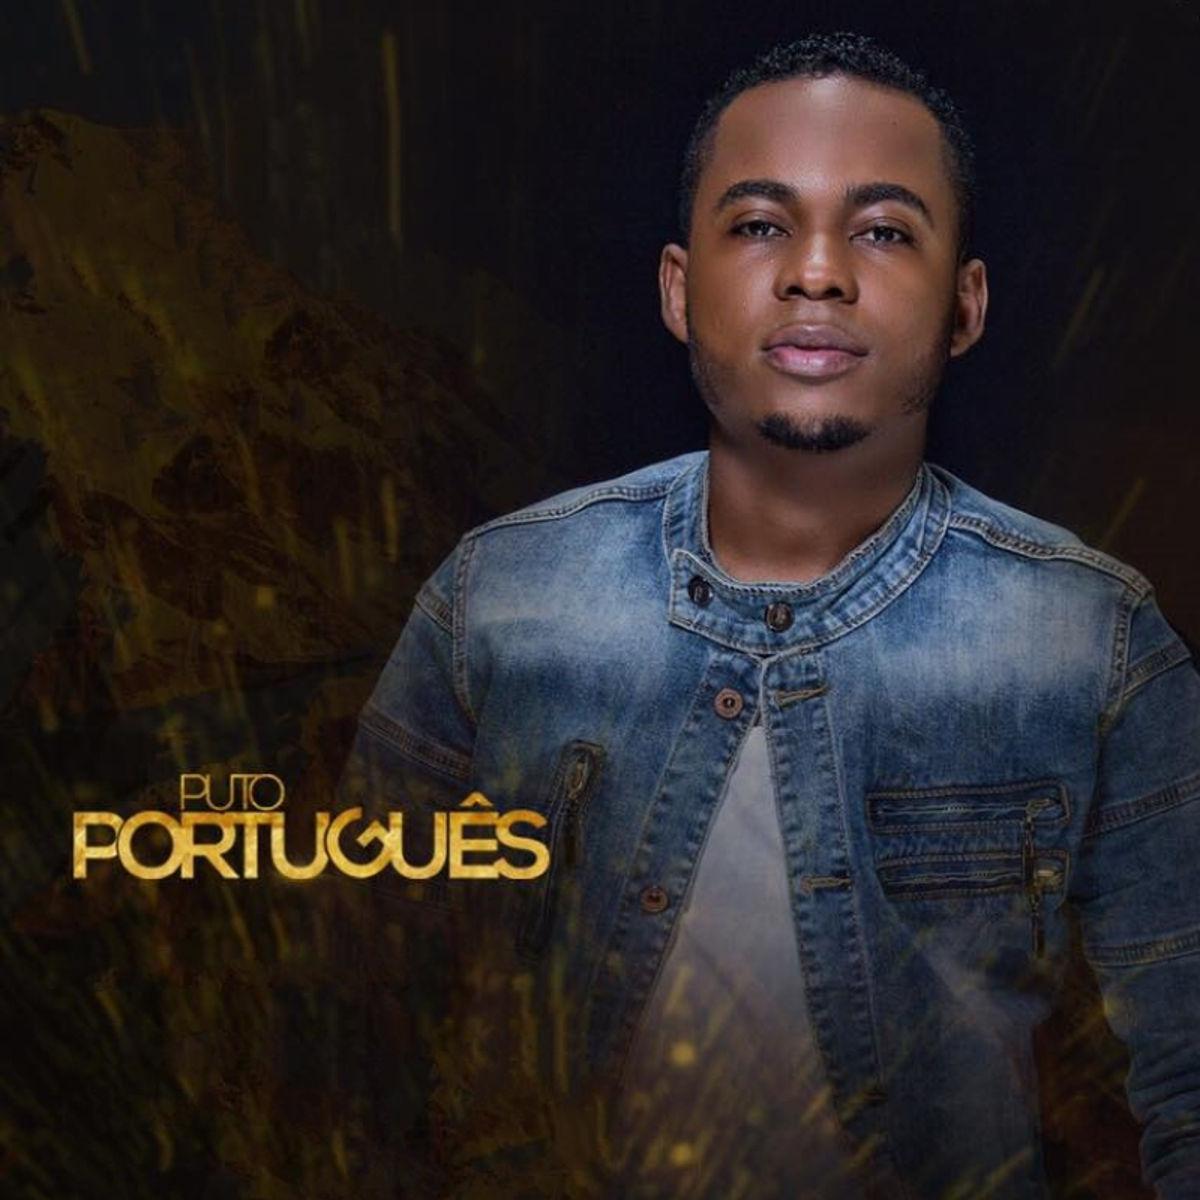 Puto Português - Te Ver Feliz (feat. Ary) 2019